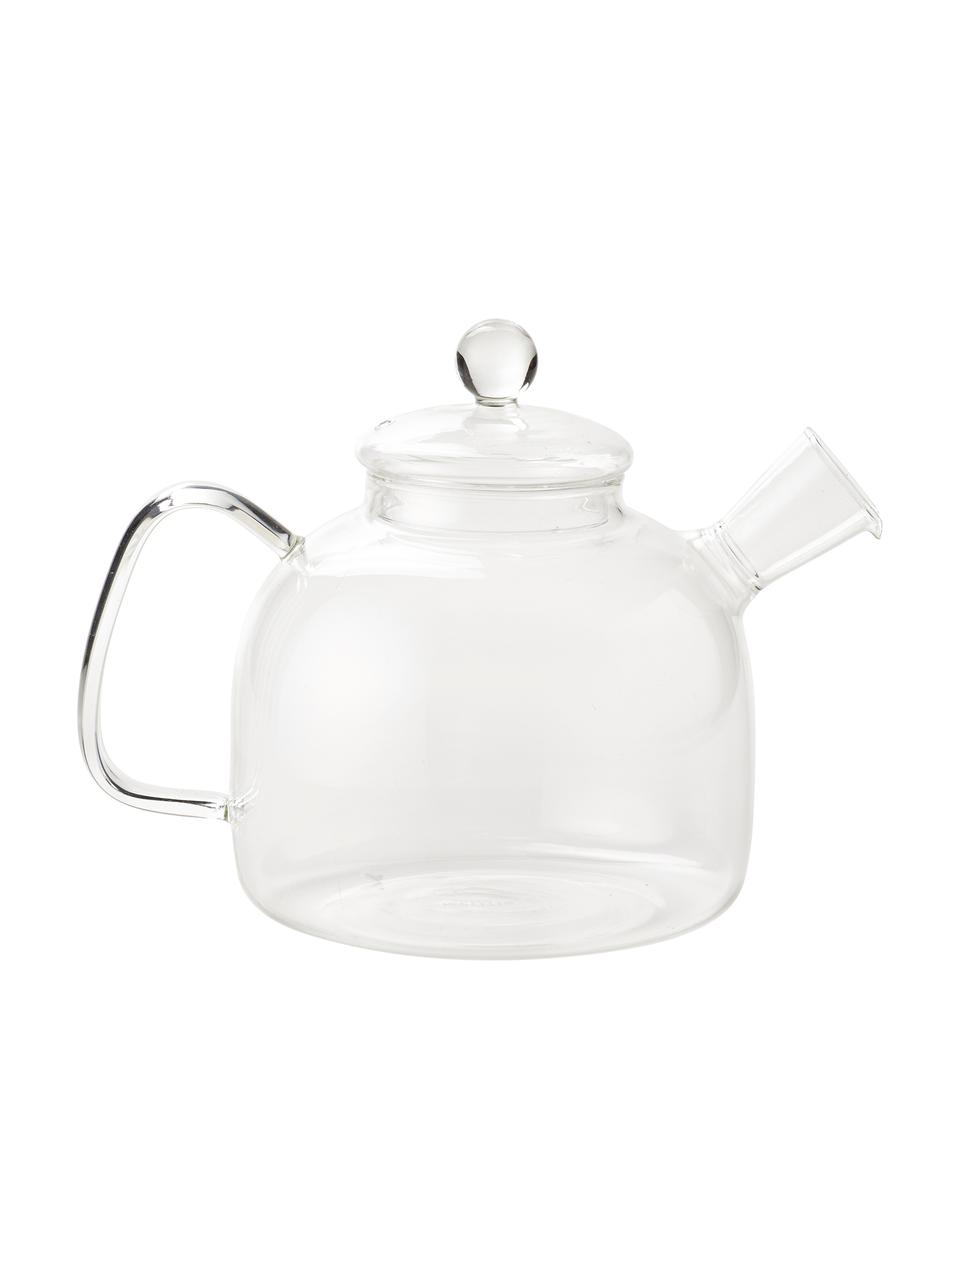 Théière verre borosilicate Boro, 1.75 L, Transparent